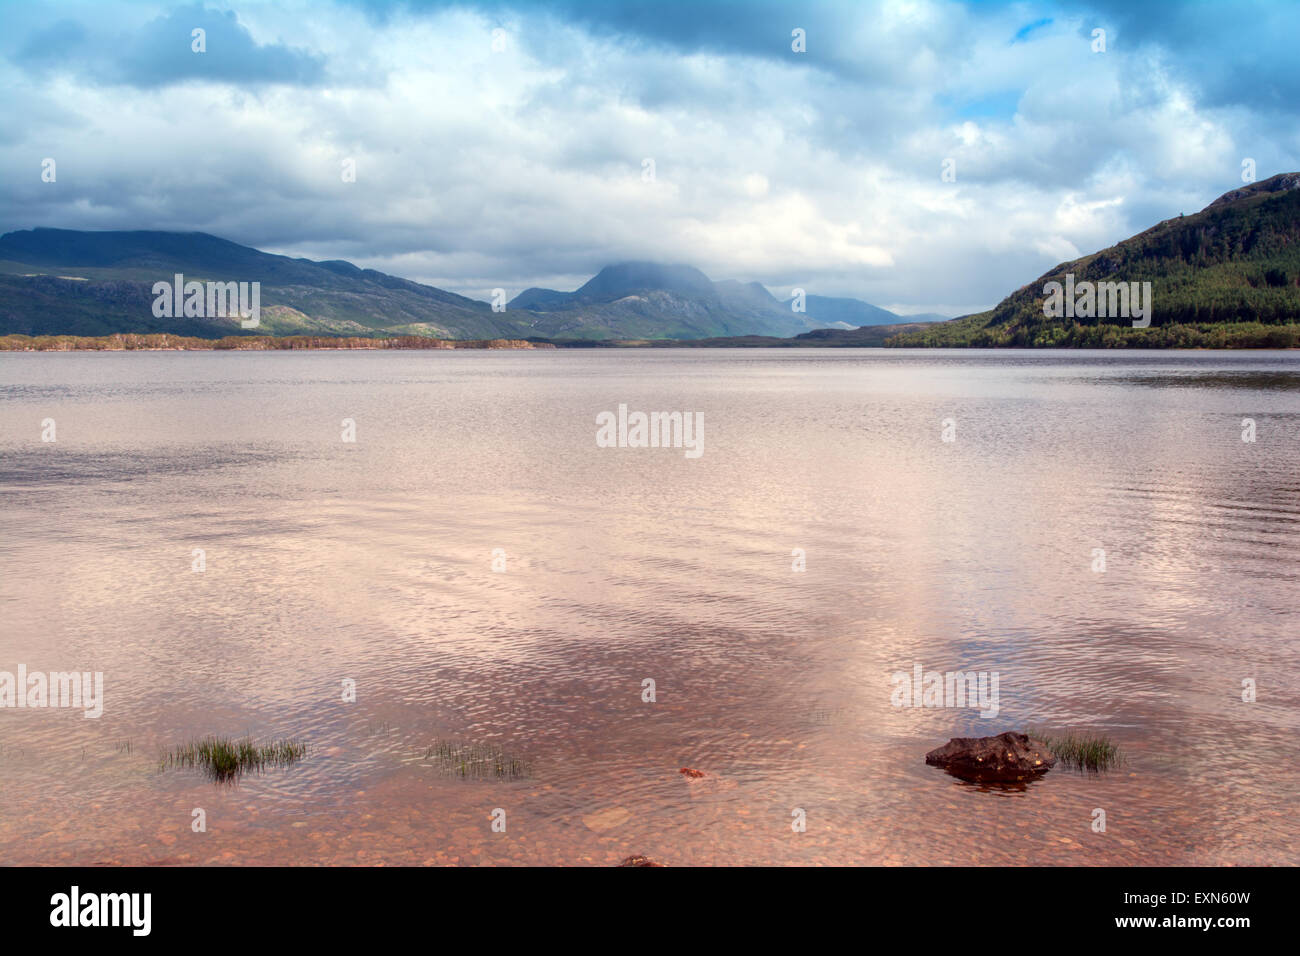 Loch Maree and Slioch - Stock Image